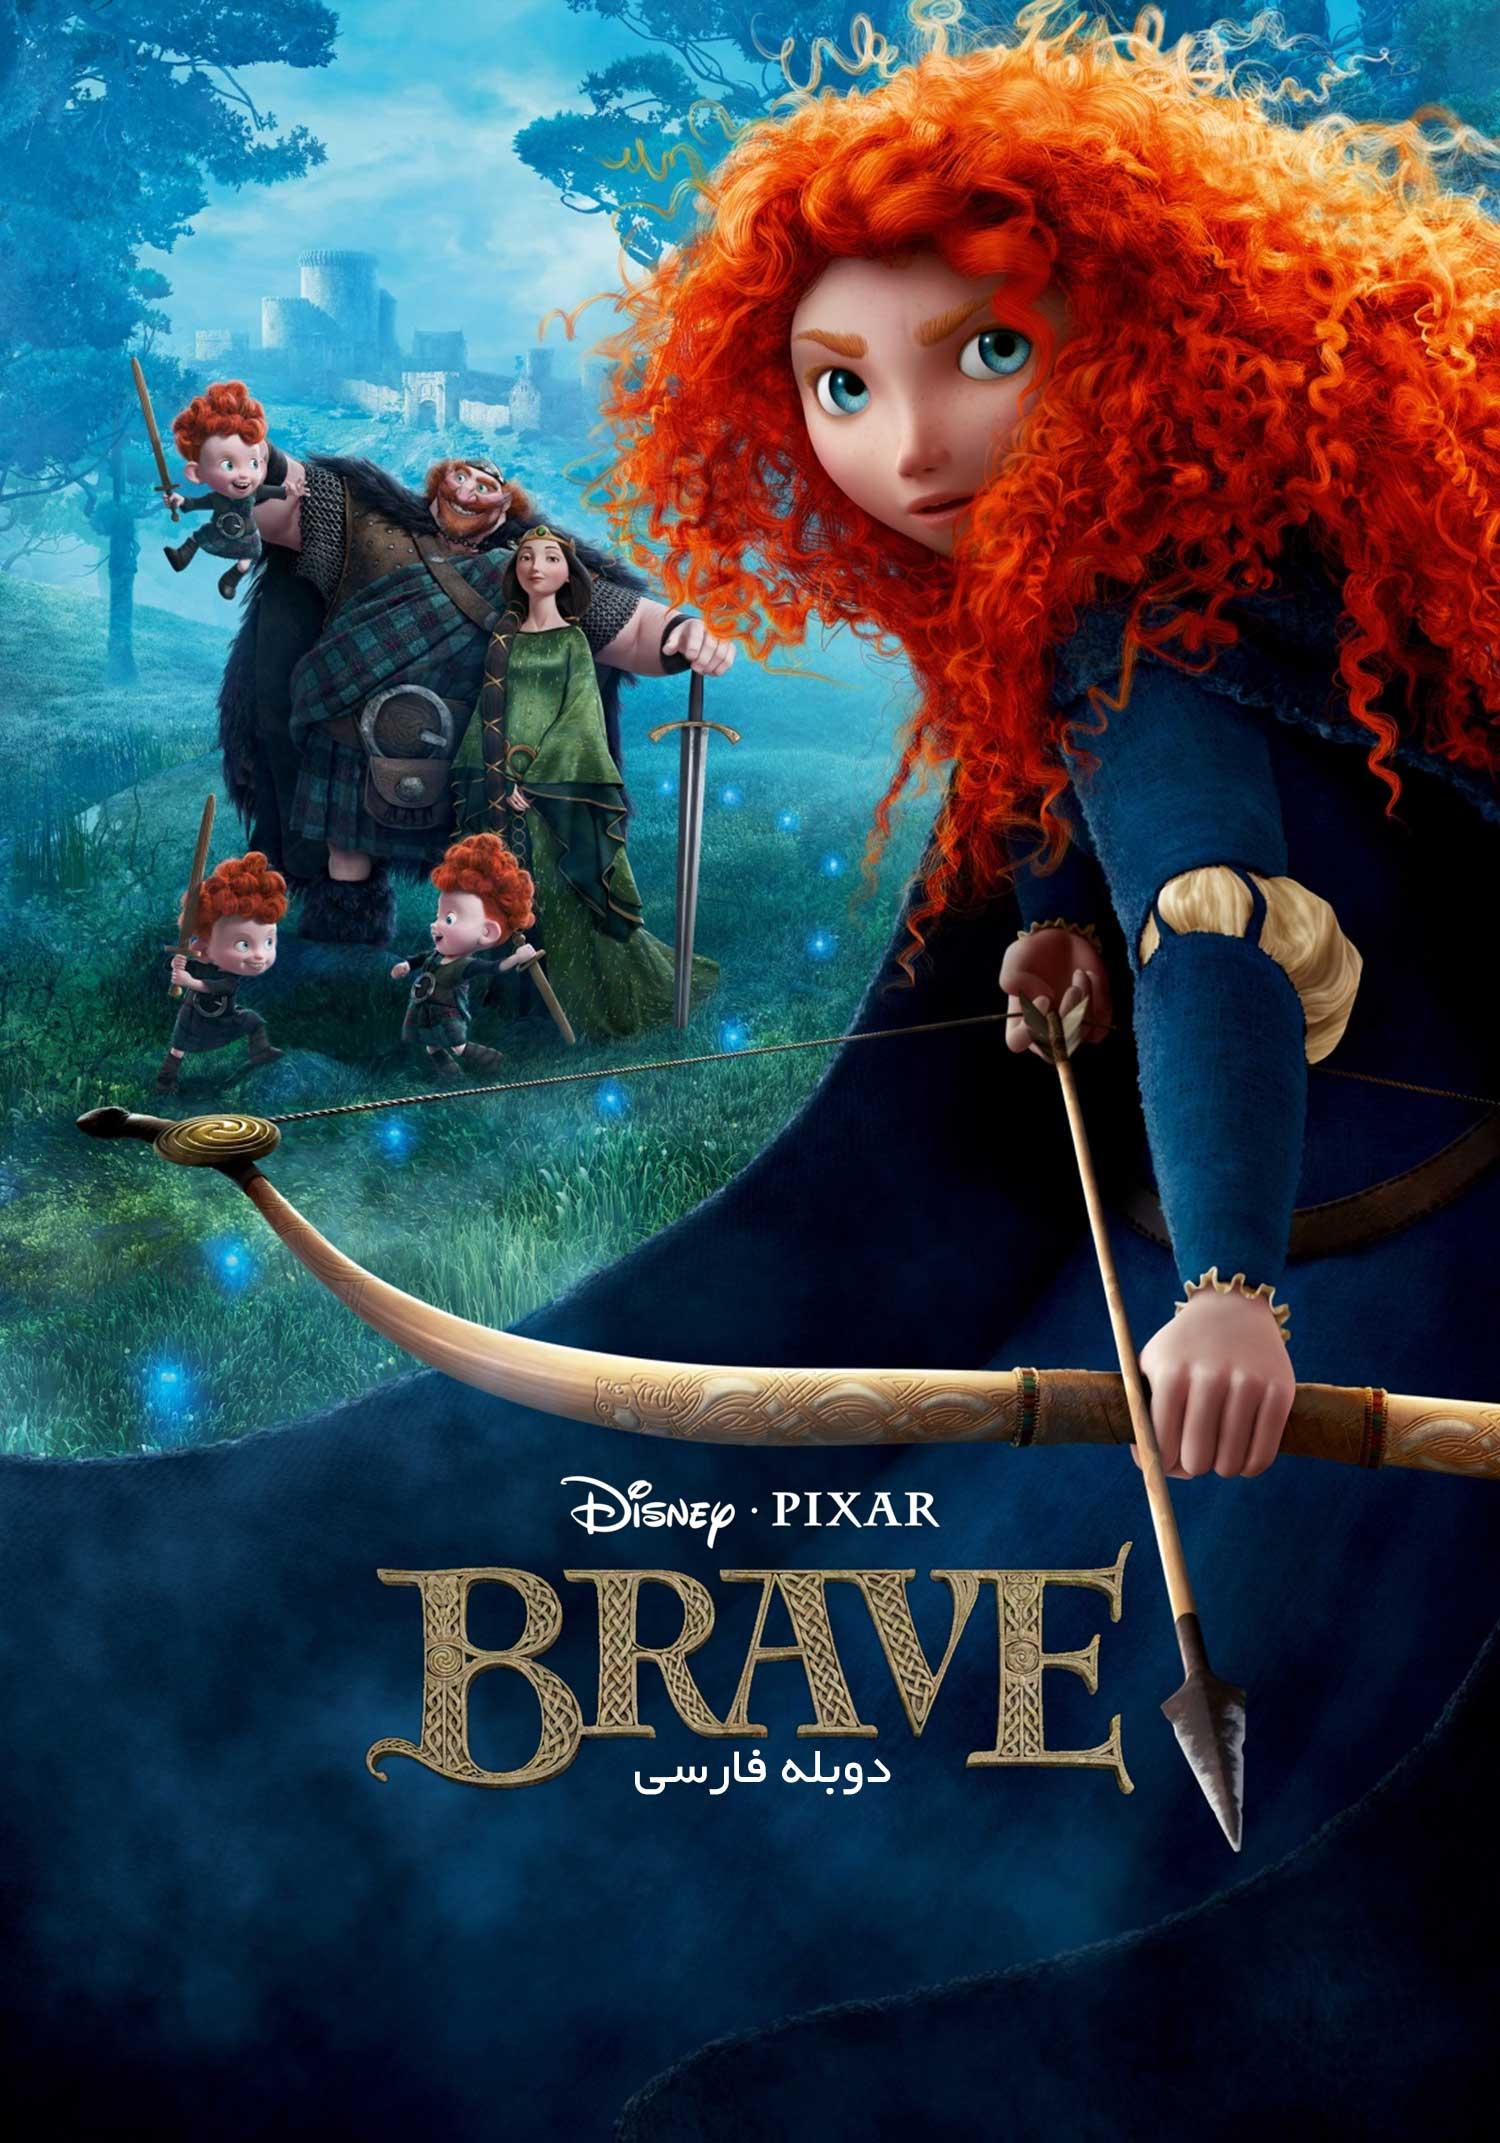 Brave - دانلود انیمیشن زیبای Brave دلیر دوبله فارسی با لینک مستقیم و همچنین به صورت مجانی و رایگان